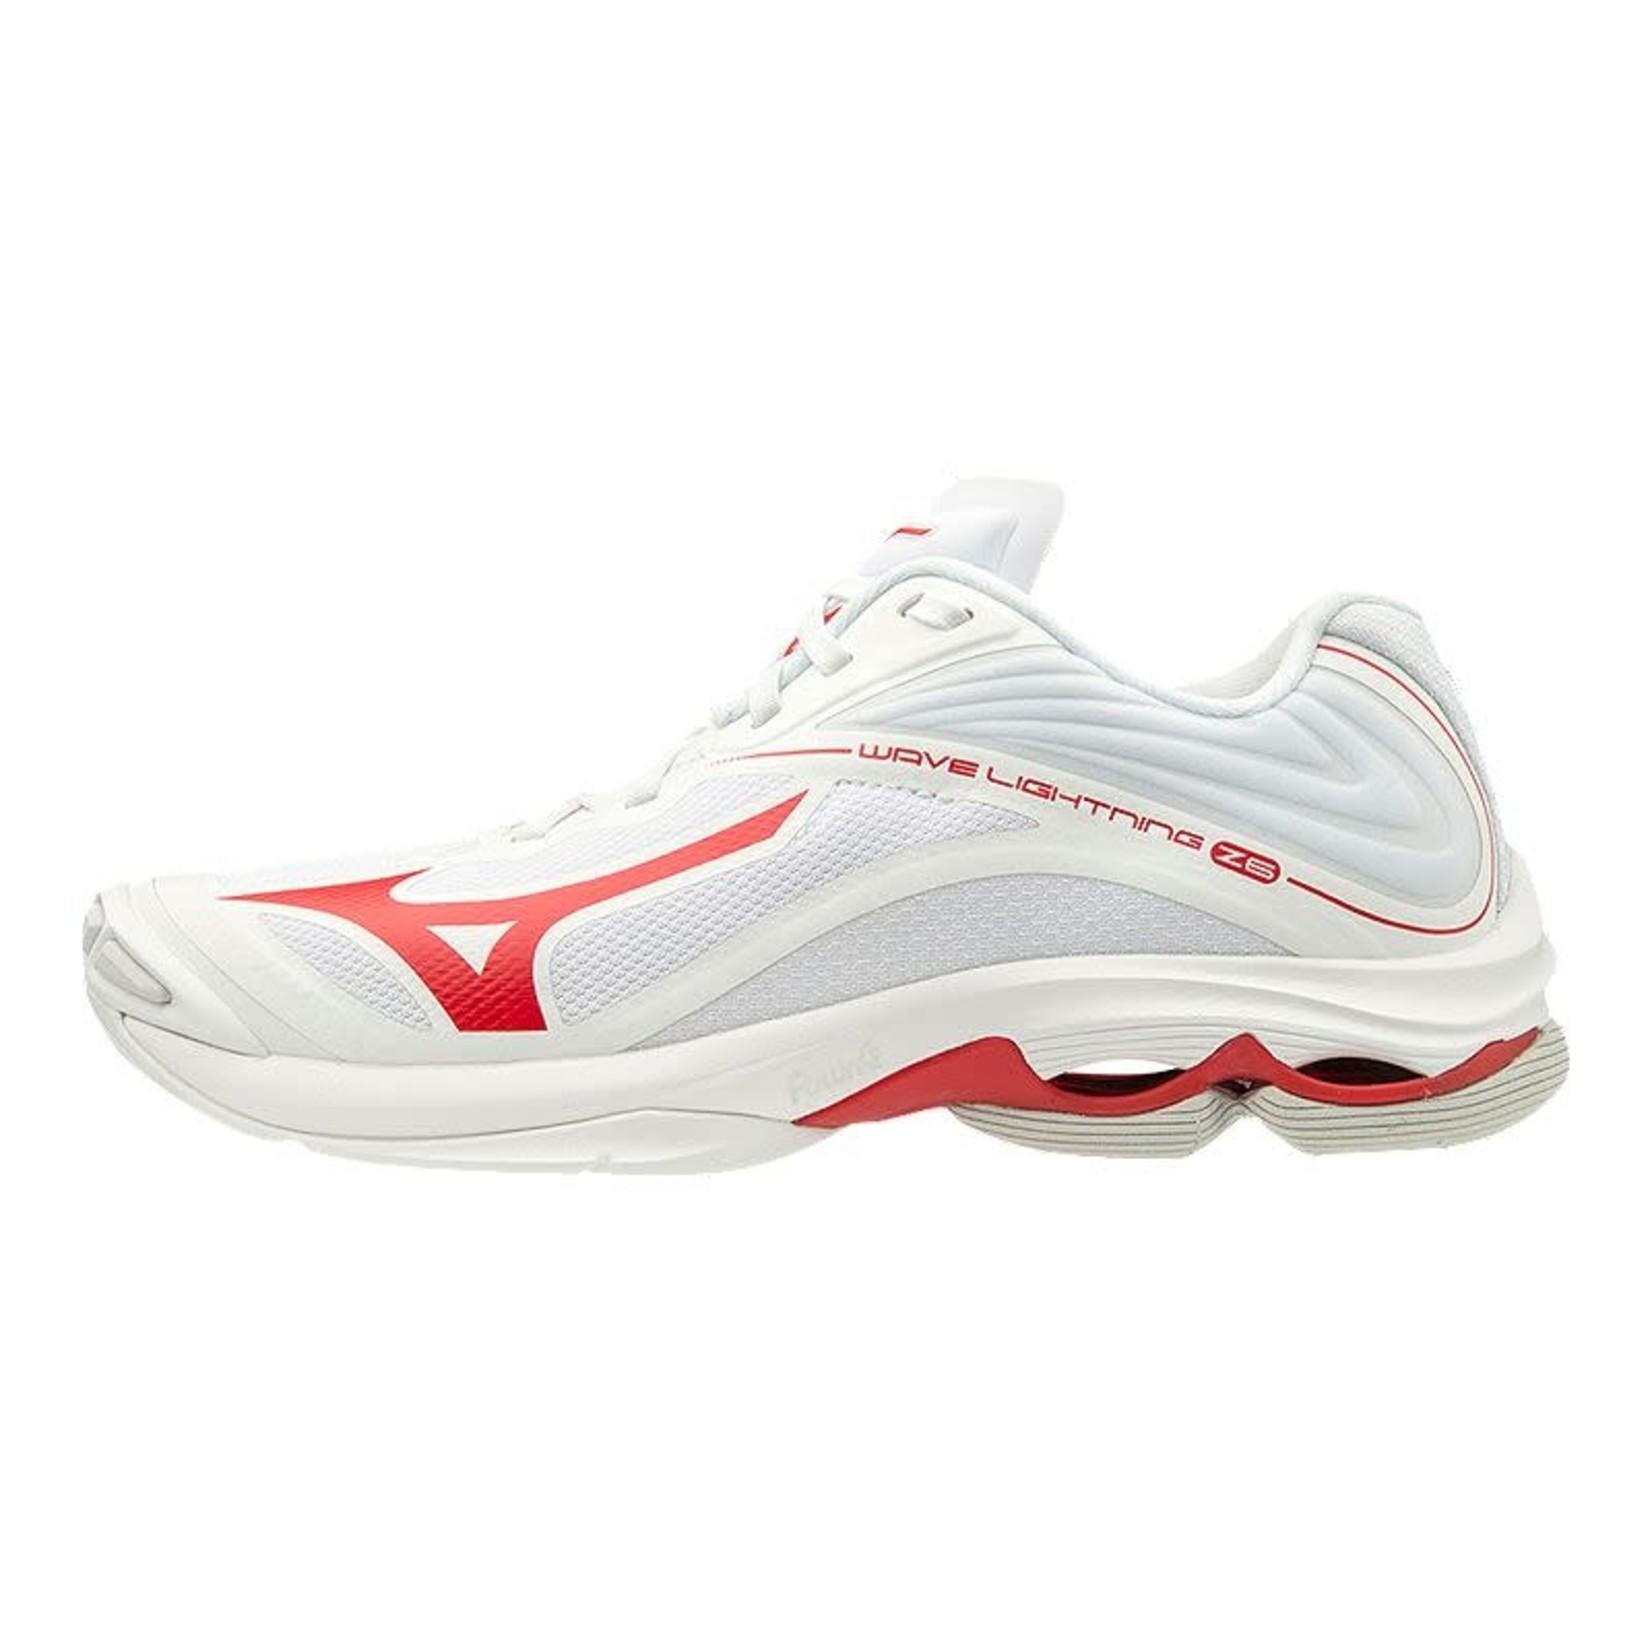 Mizuno Mizuno Volleyball Shoes, Wave Lightning Z6, Ladies